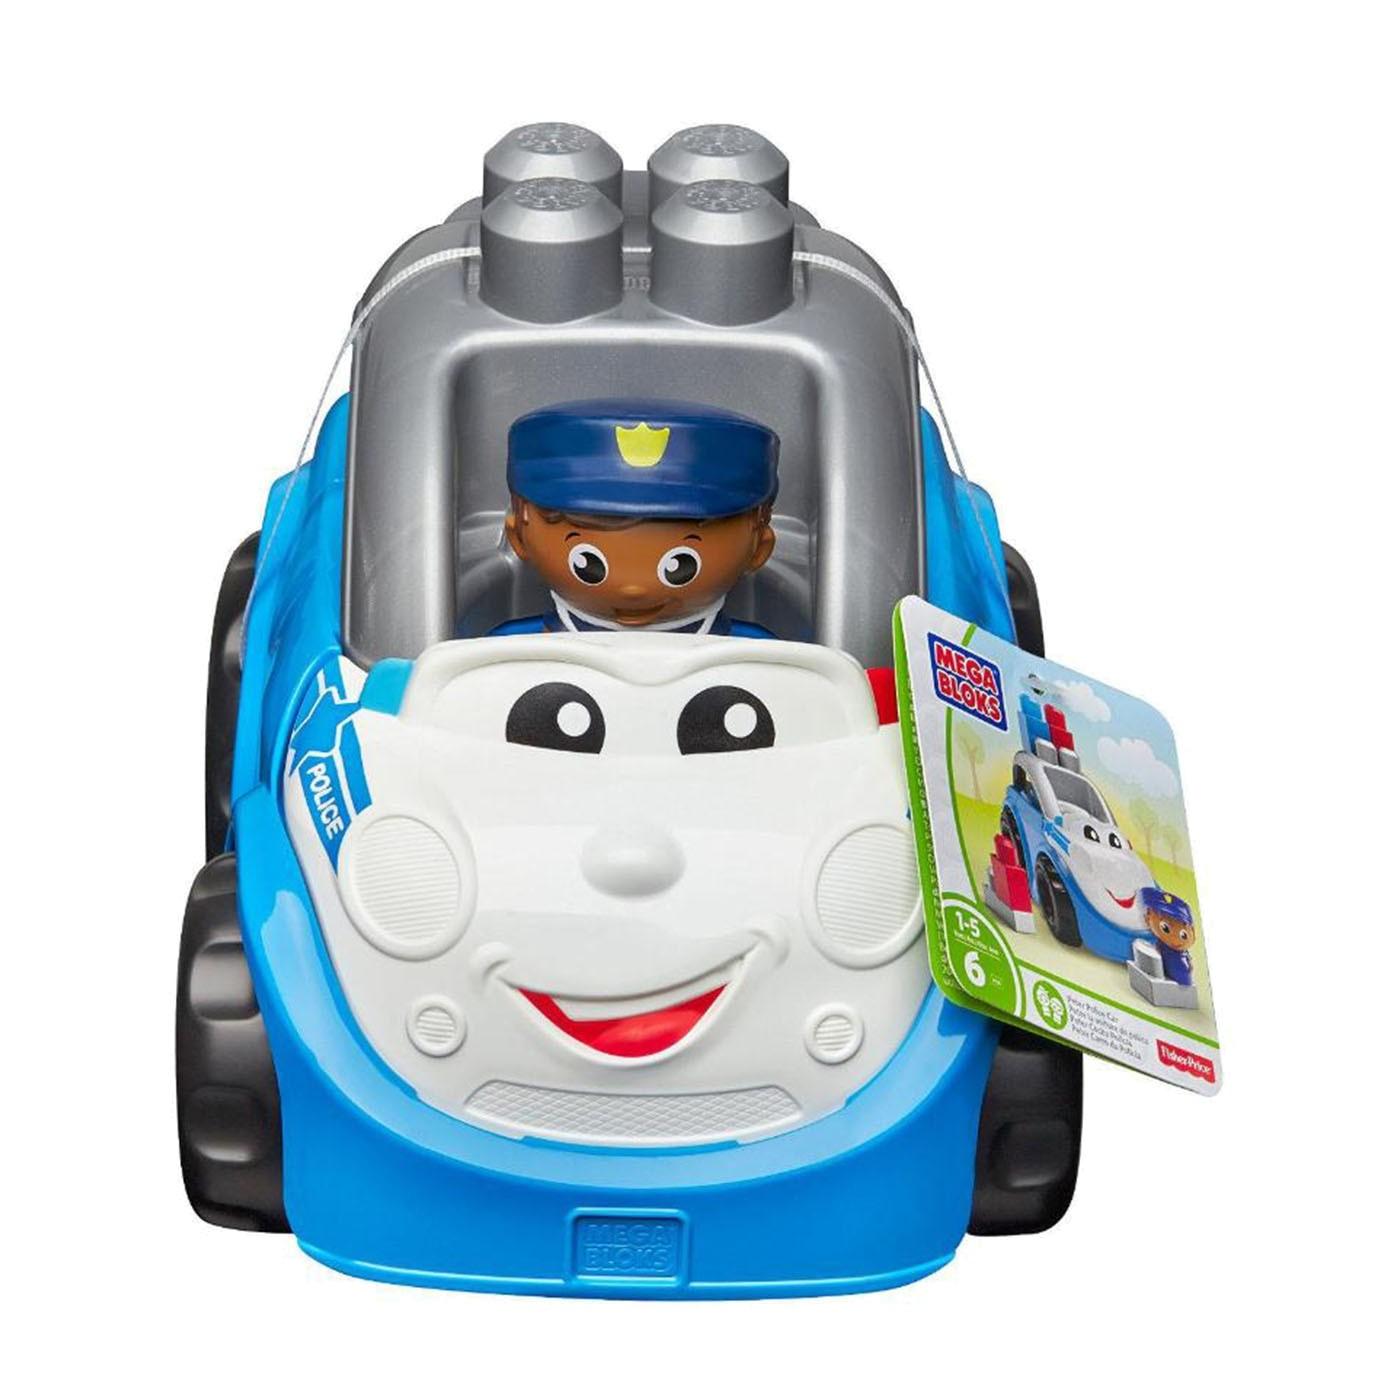 PETER POLICE CAR